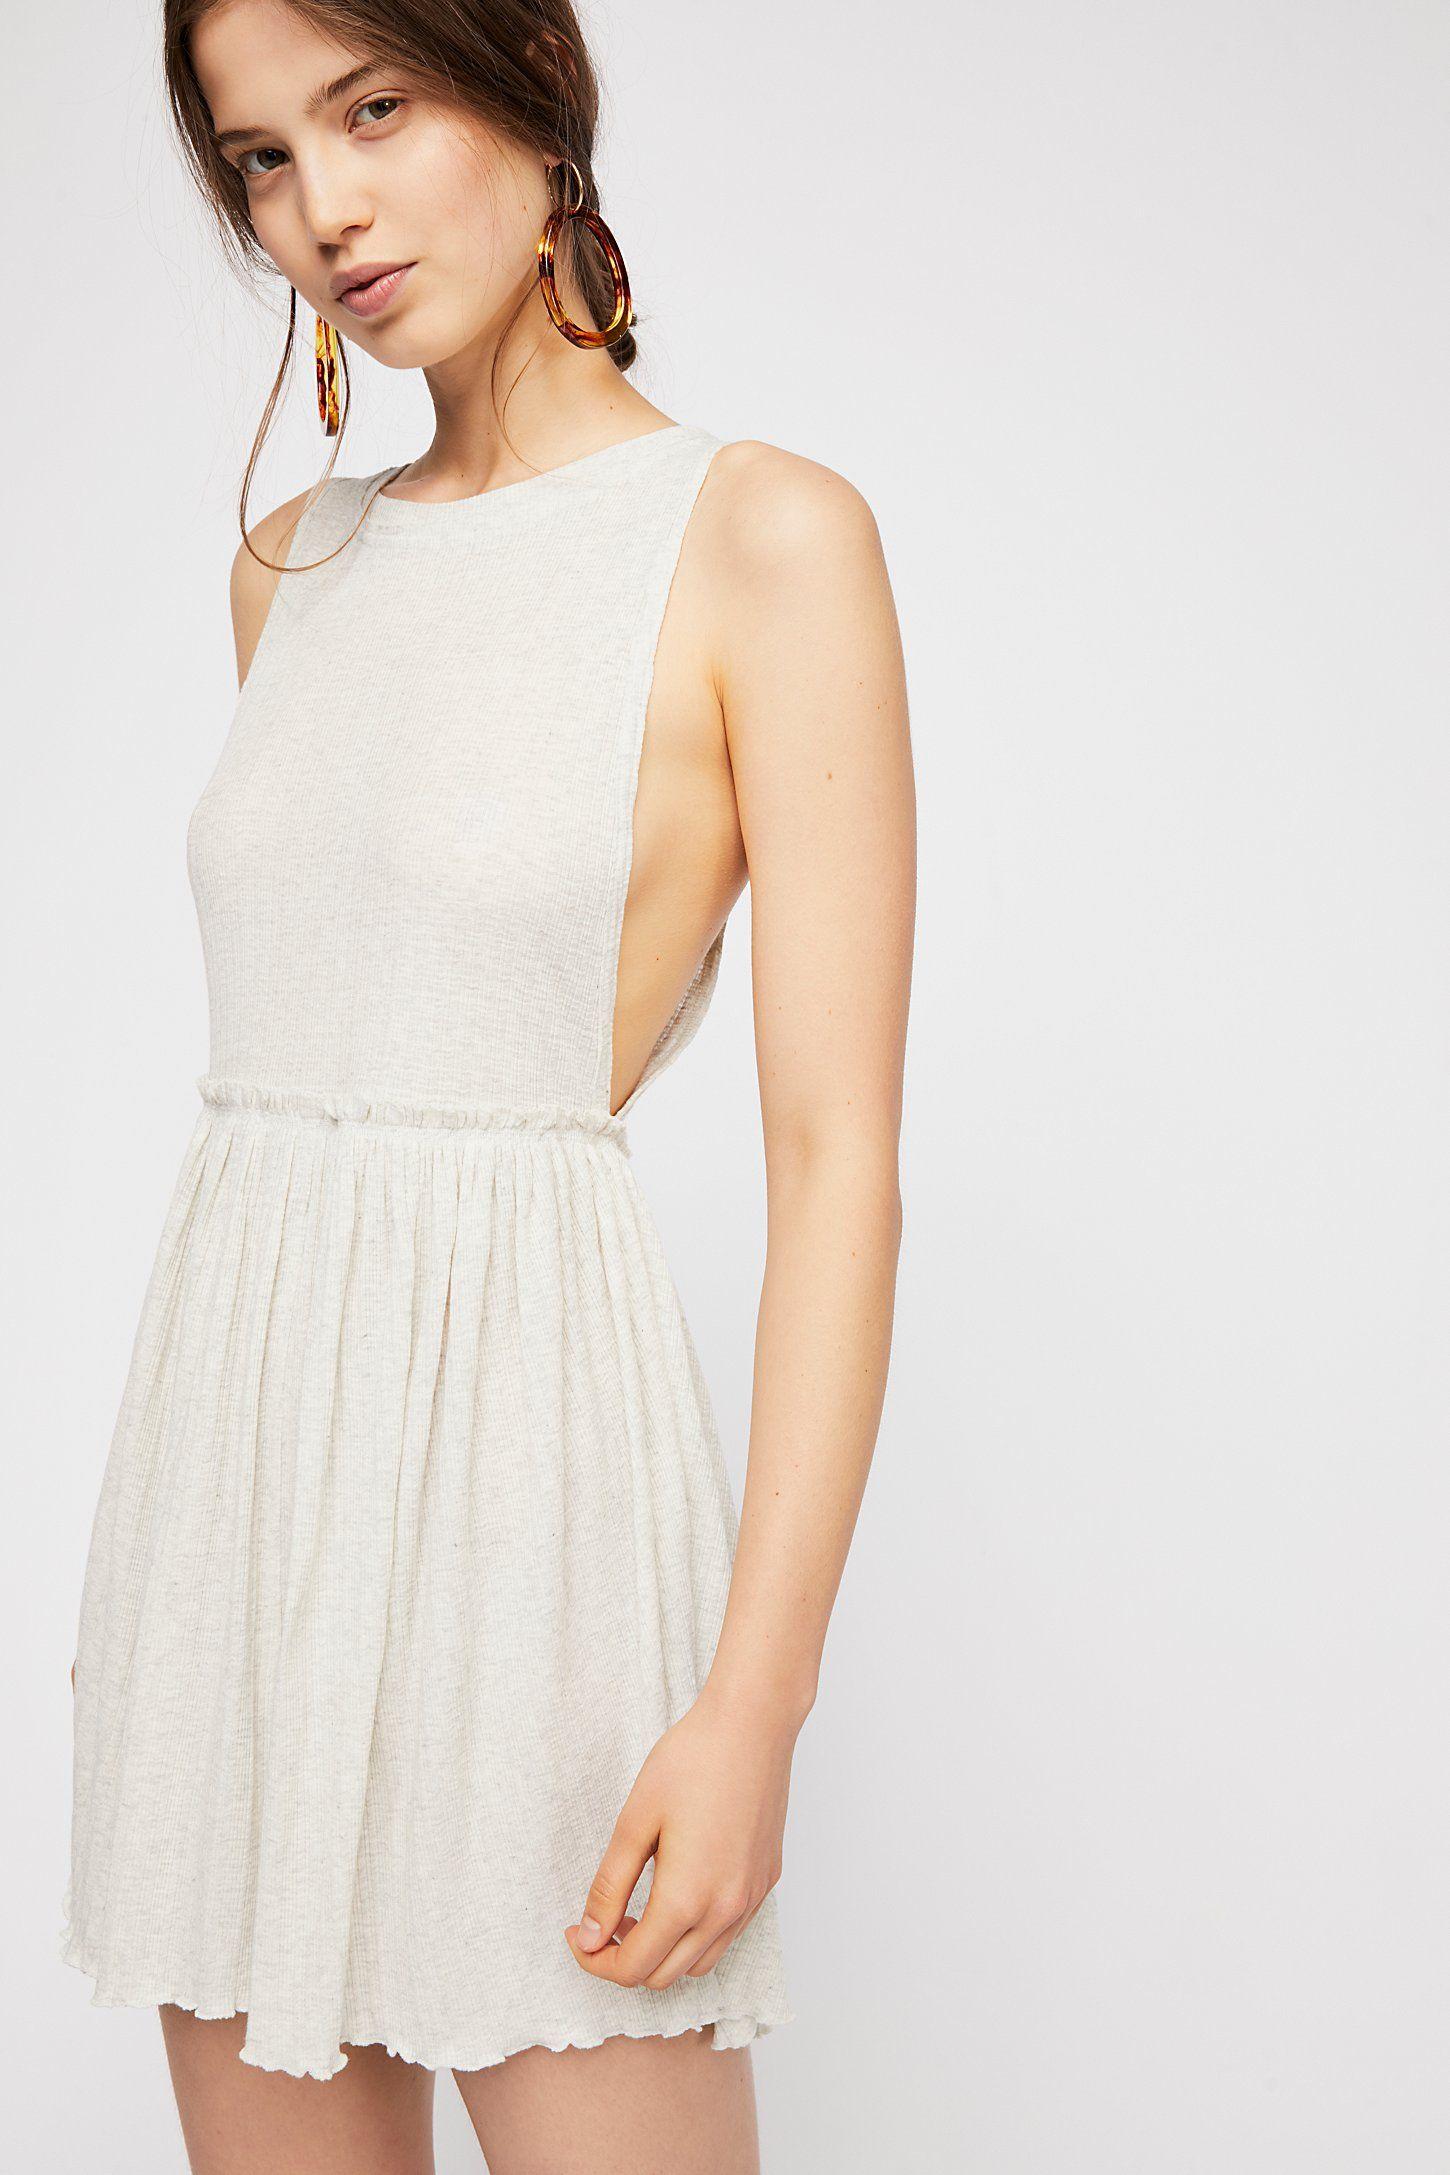 1251d2e95eec BRB Mini Dress in 2019 | Summer | Dresses, Dress outfits, Mini